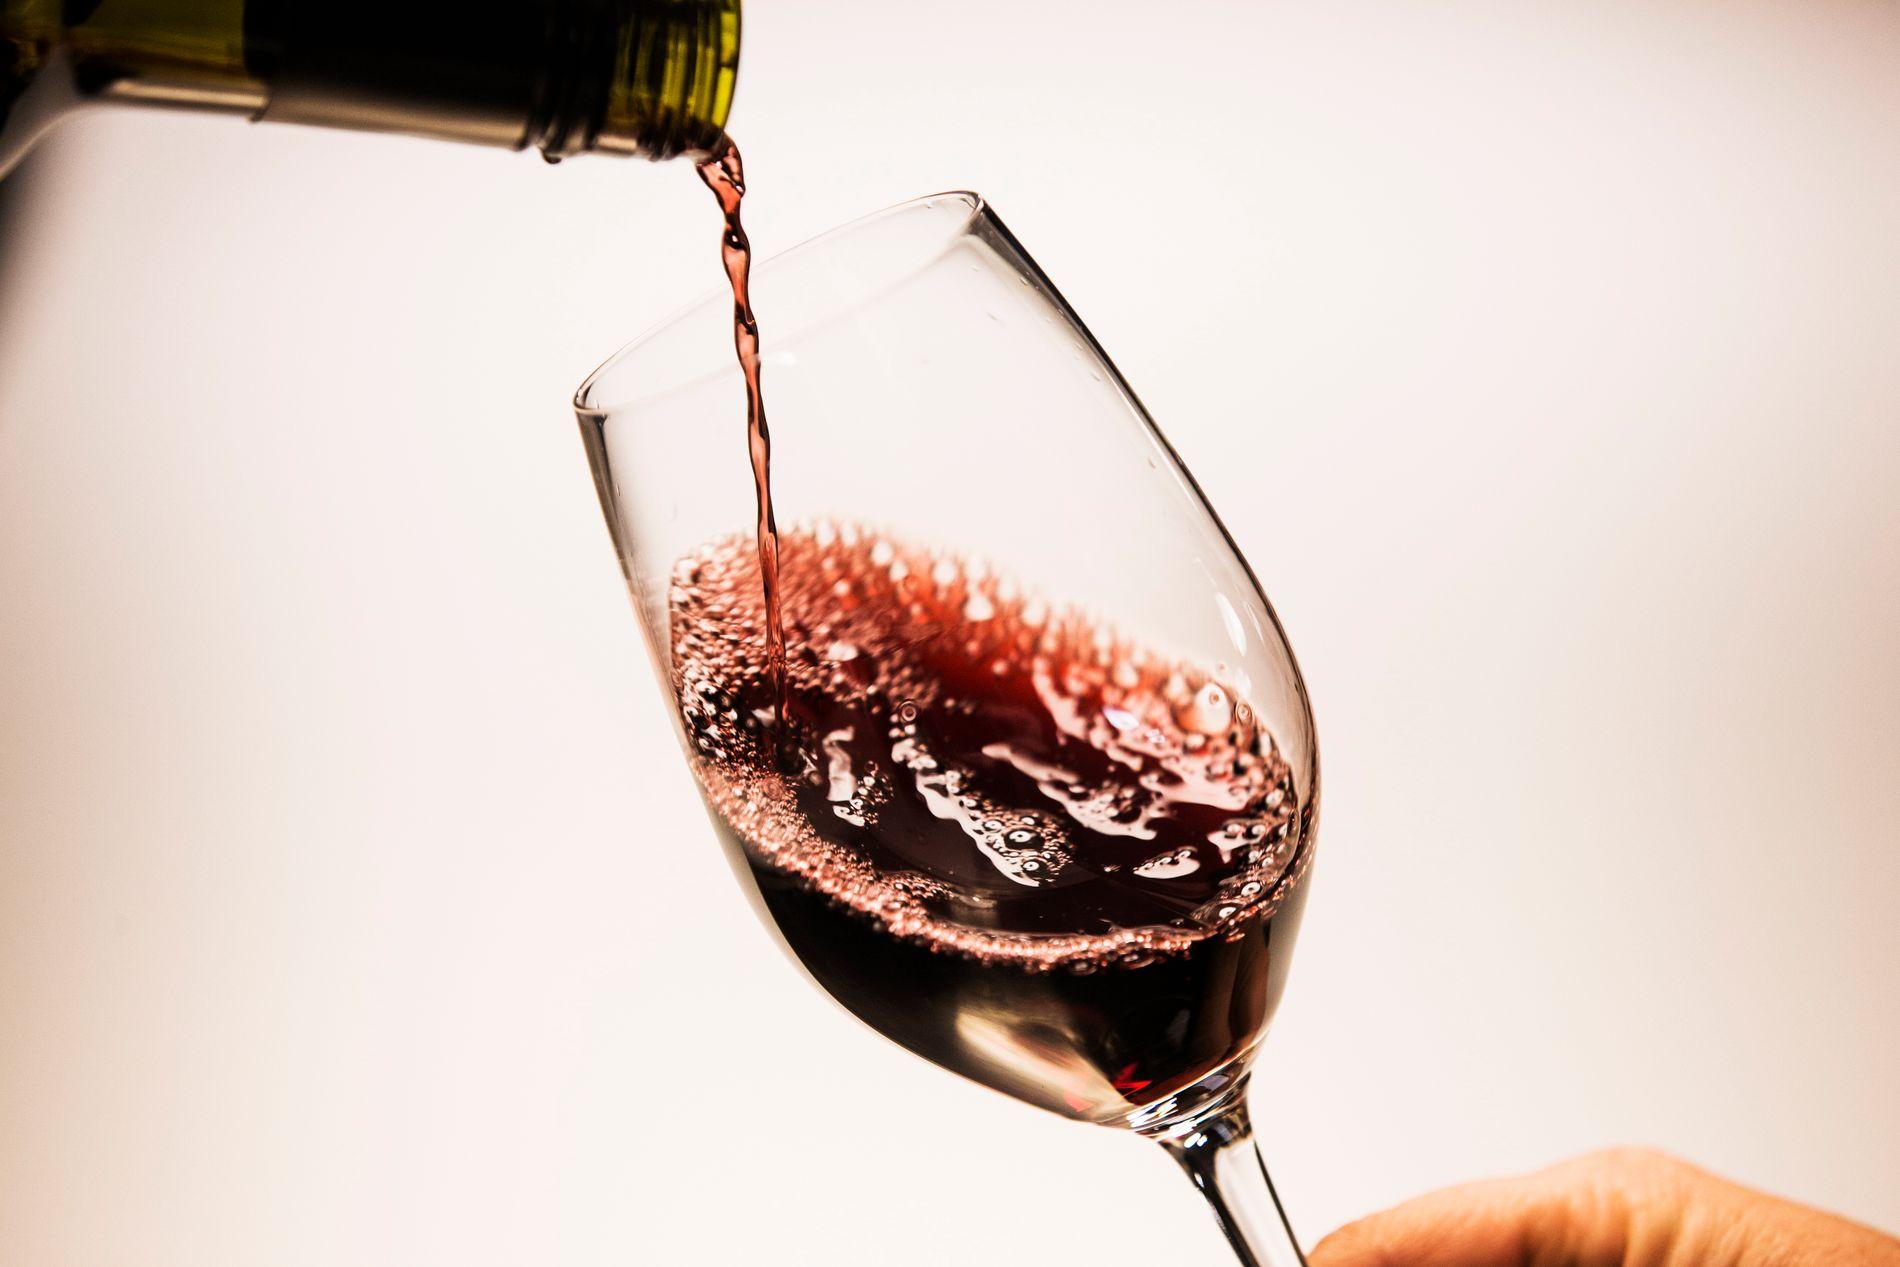 vinmonopolet påsken 2020